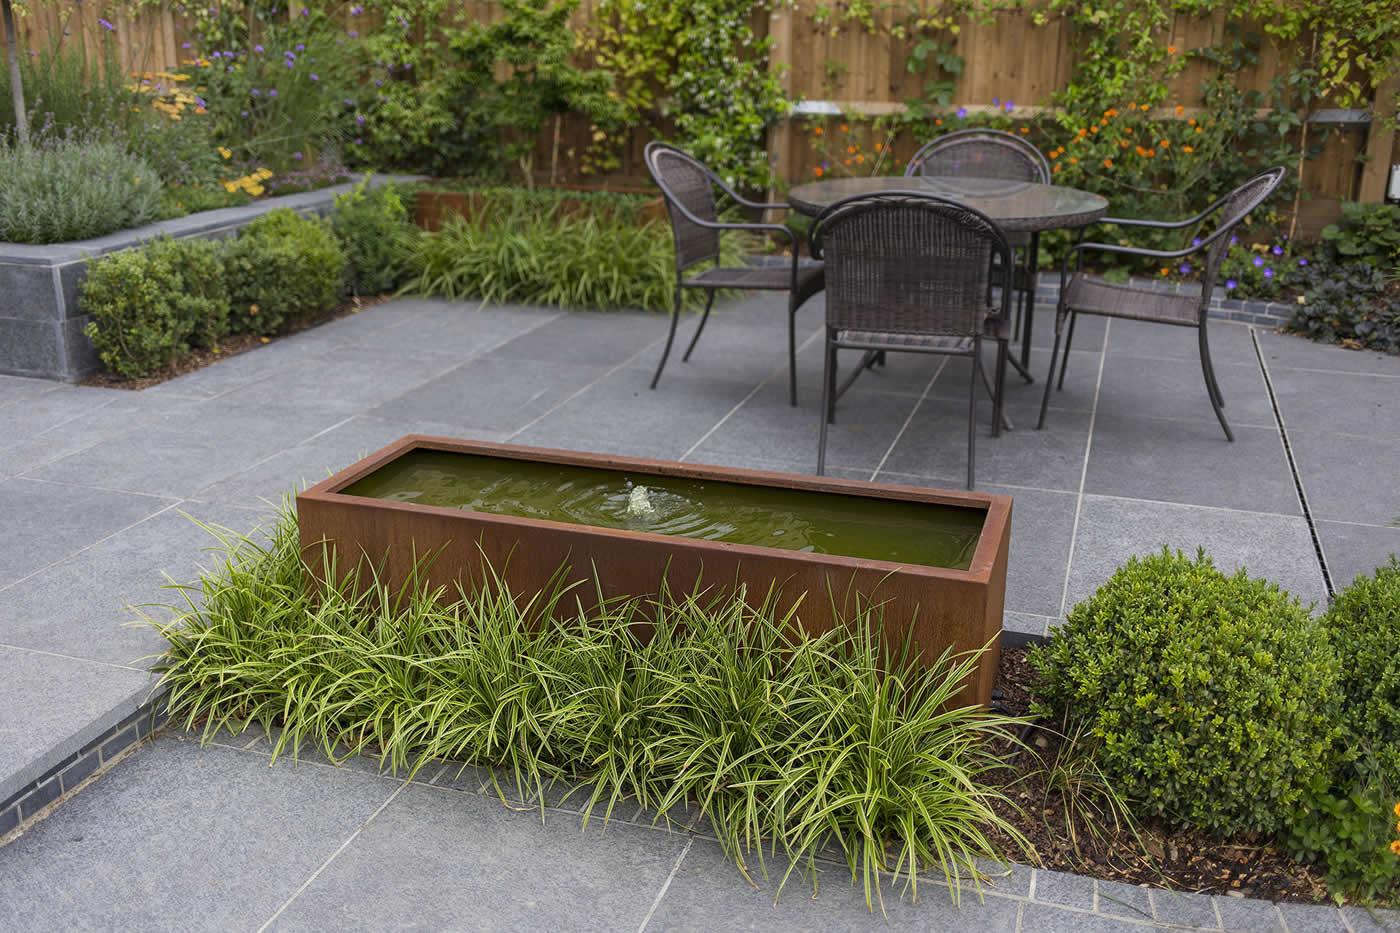 Family garden living space designed with informal for Informal garden designs